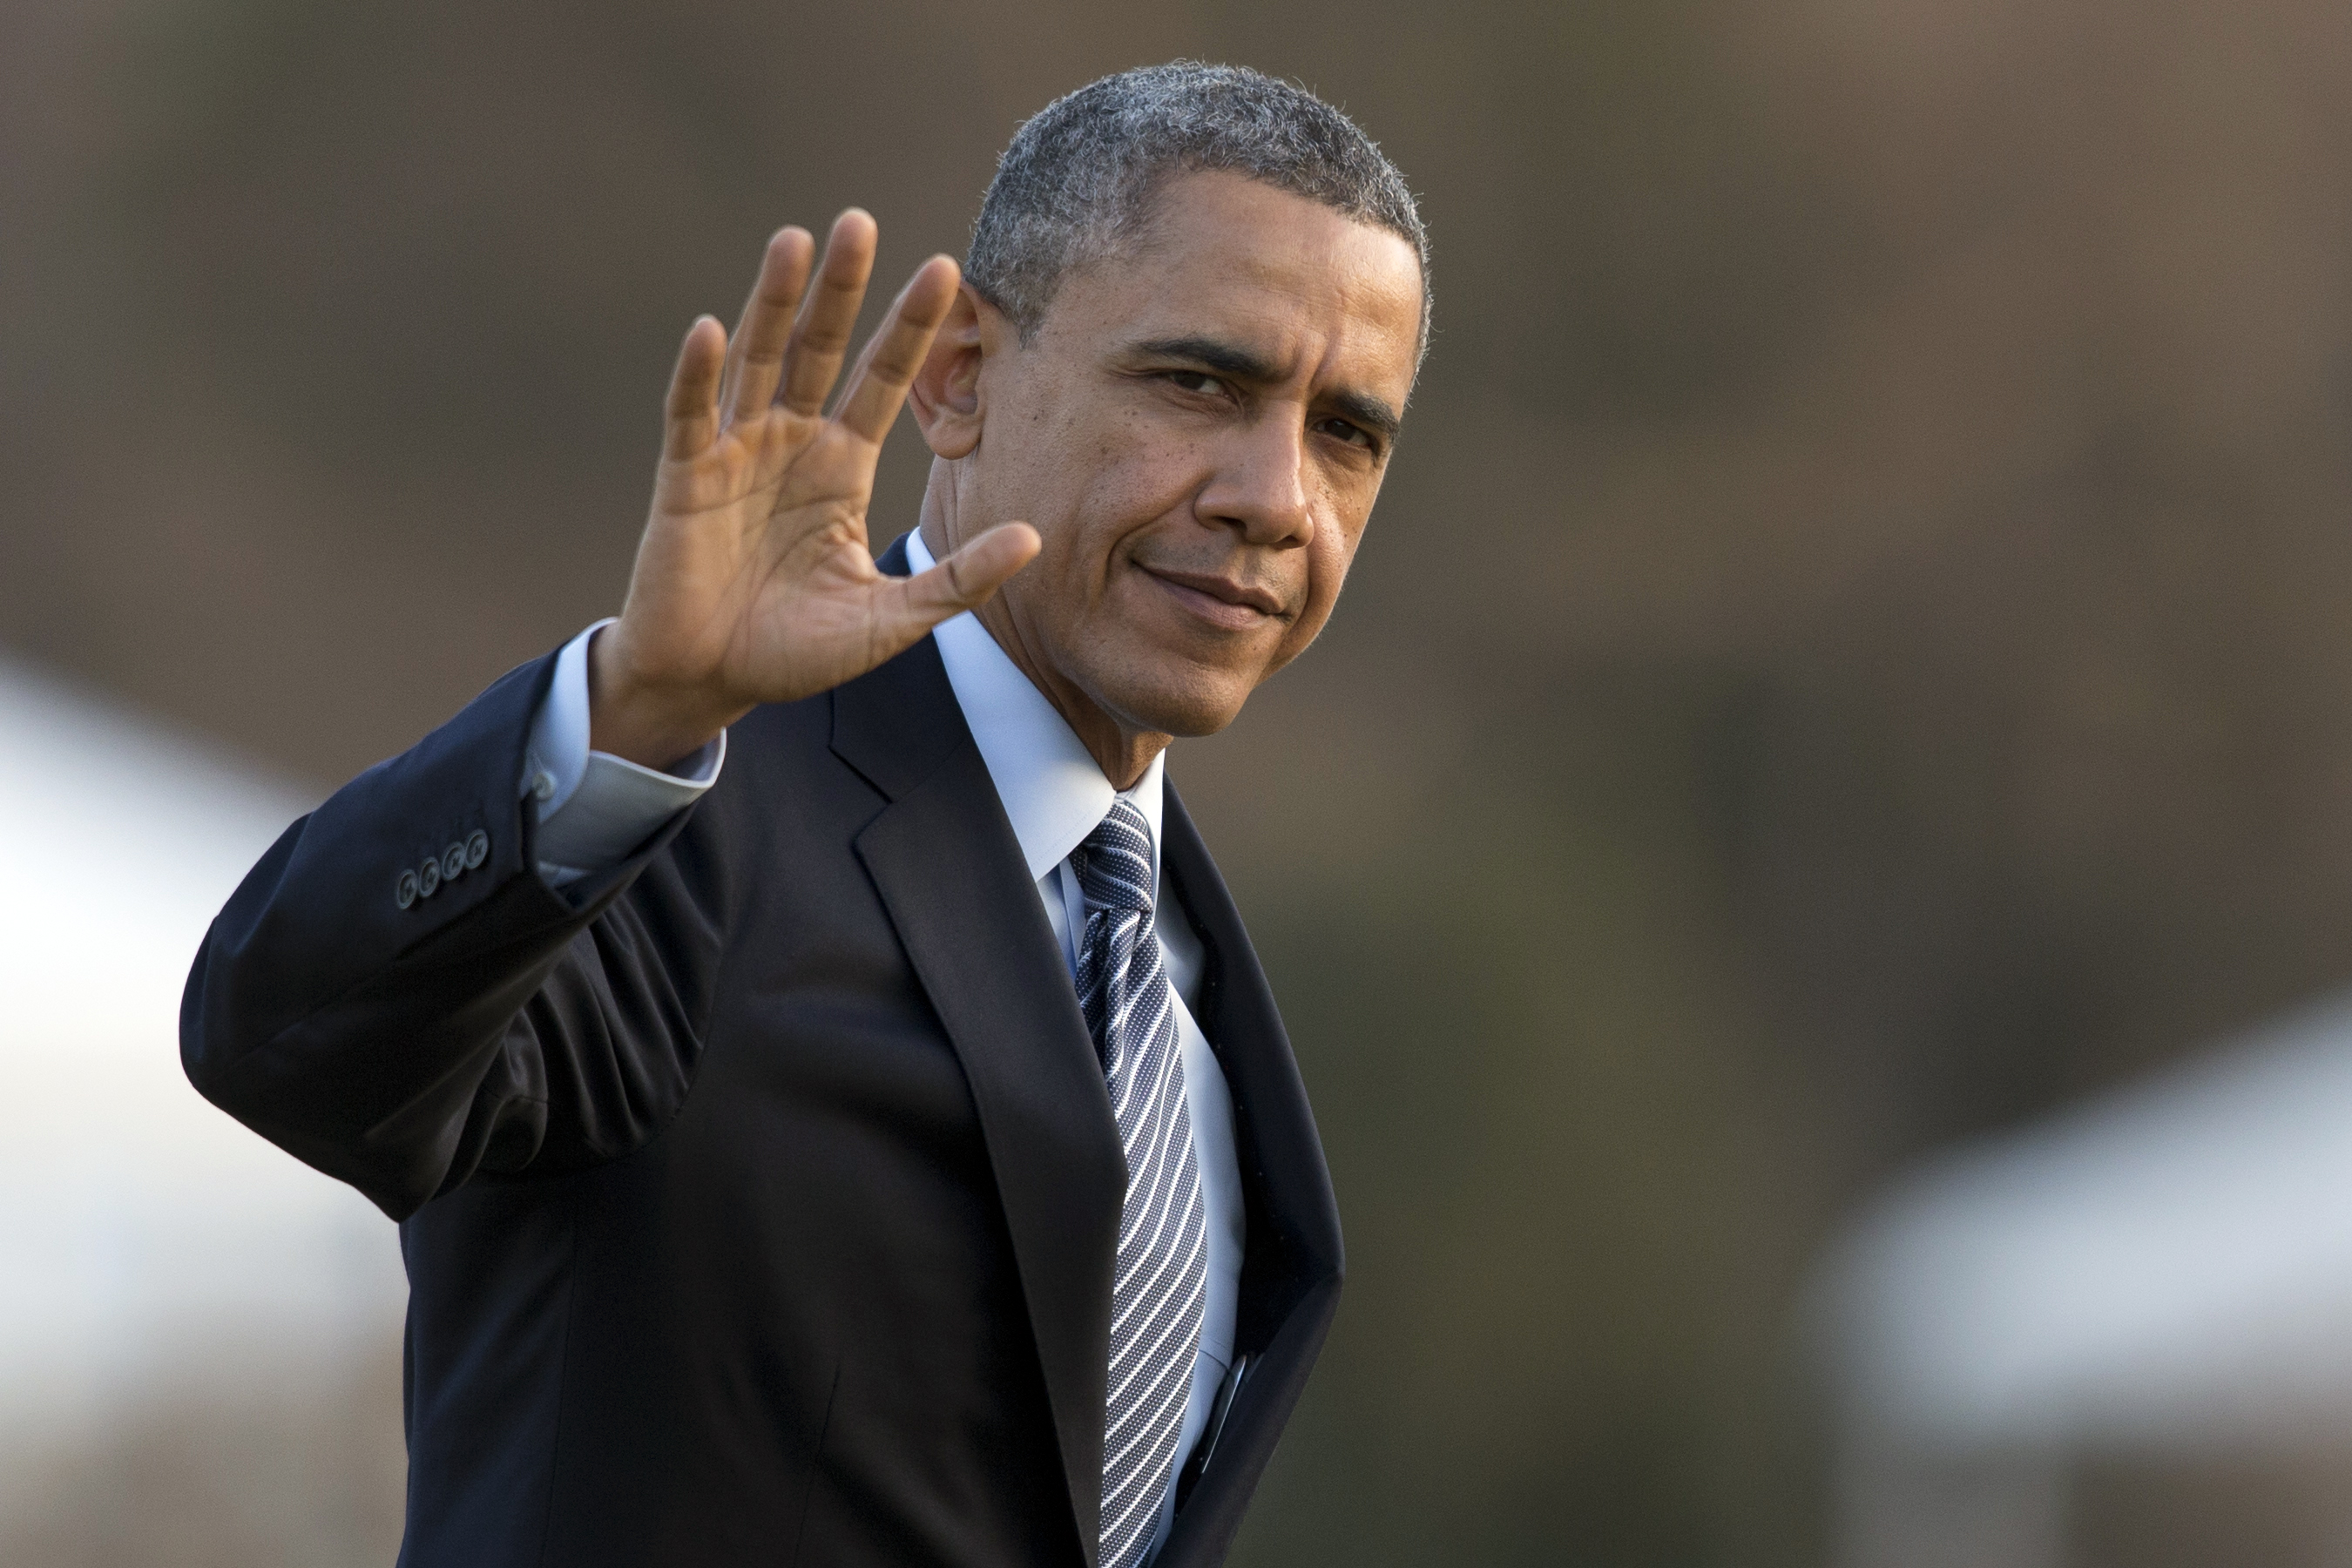 Image result for waving president obama